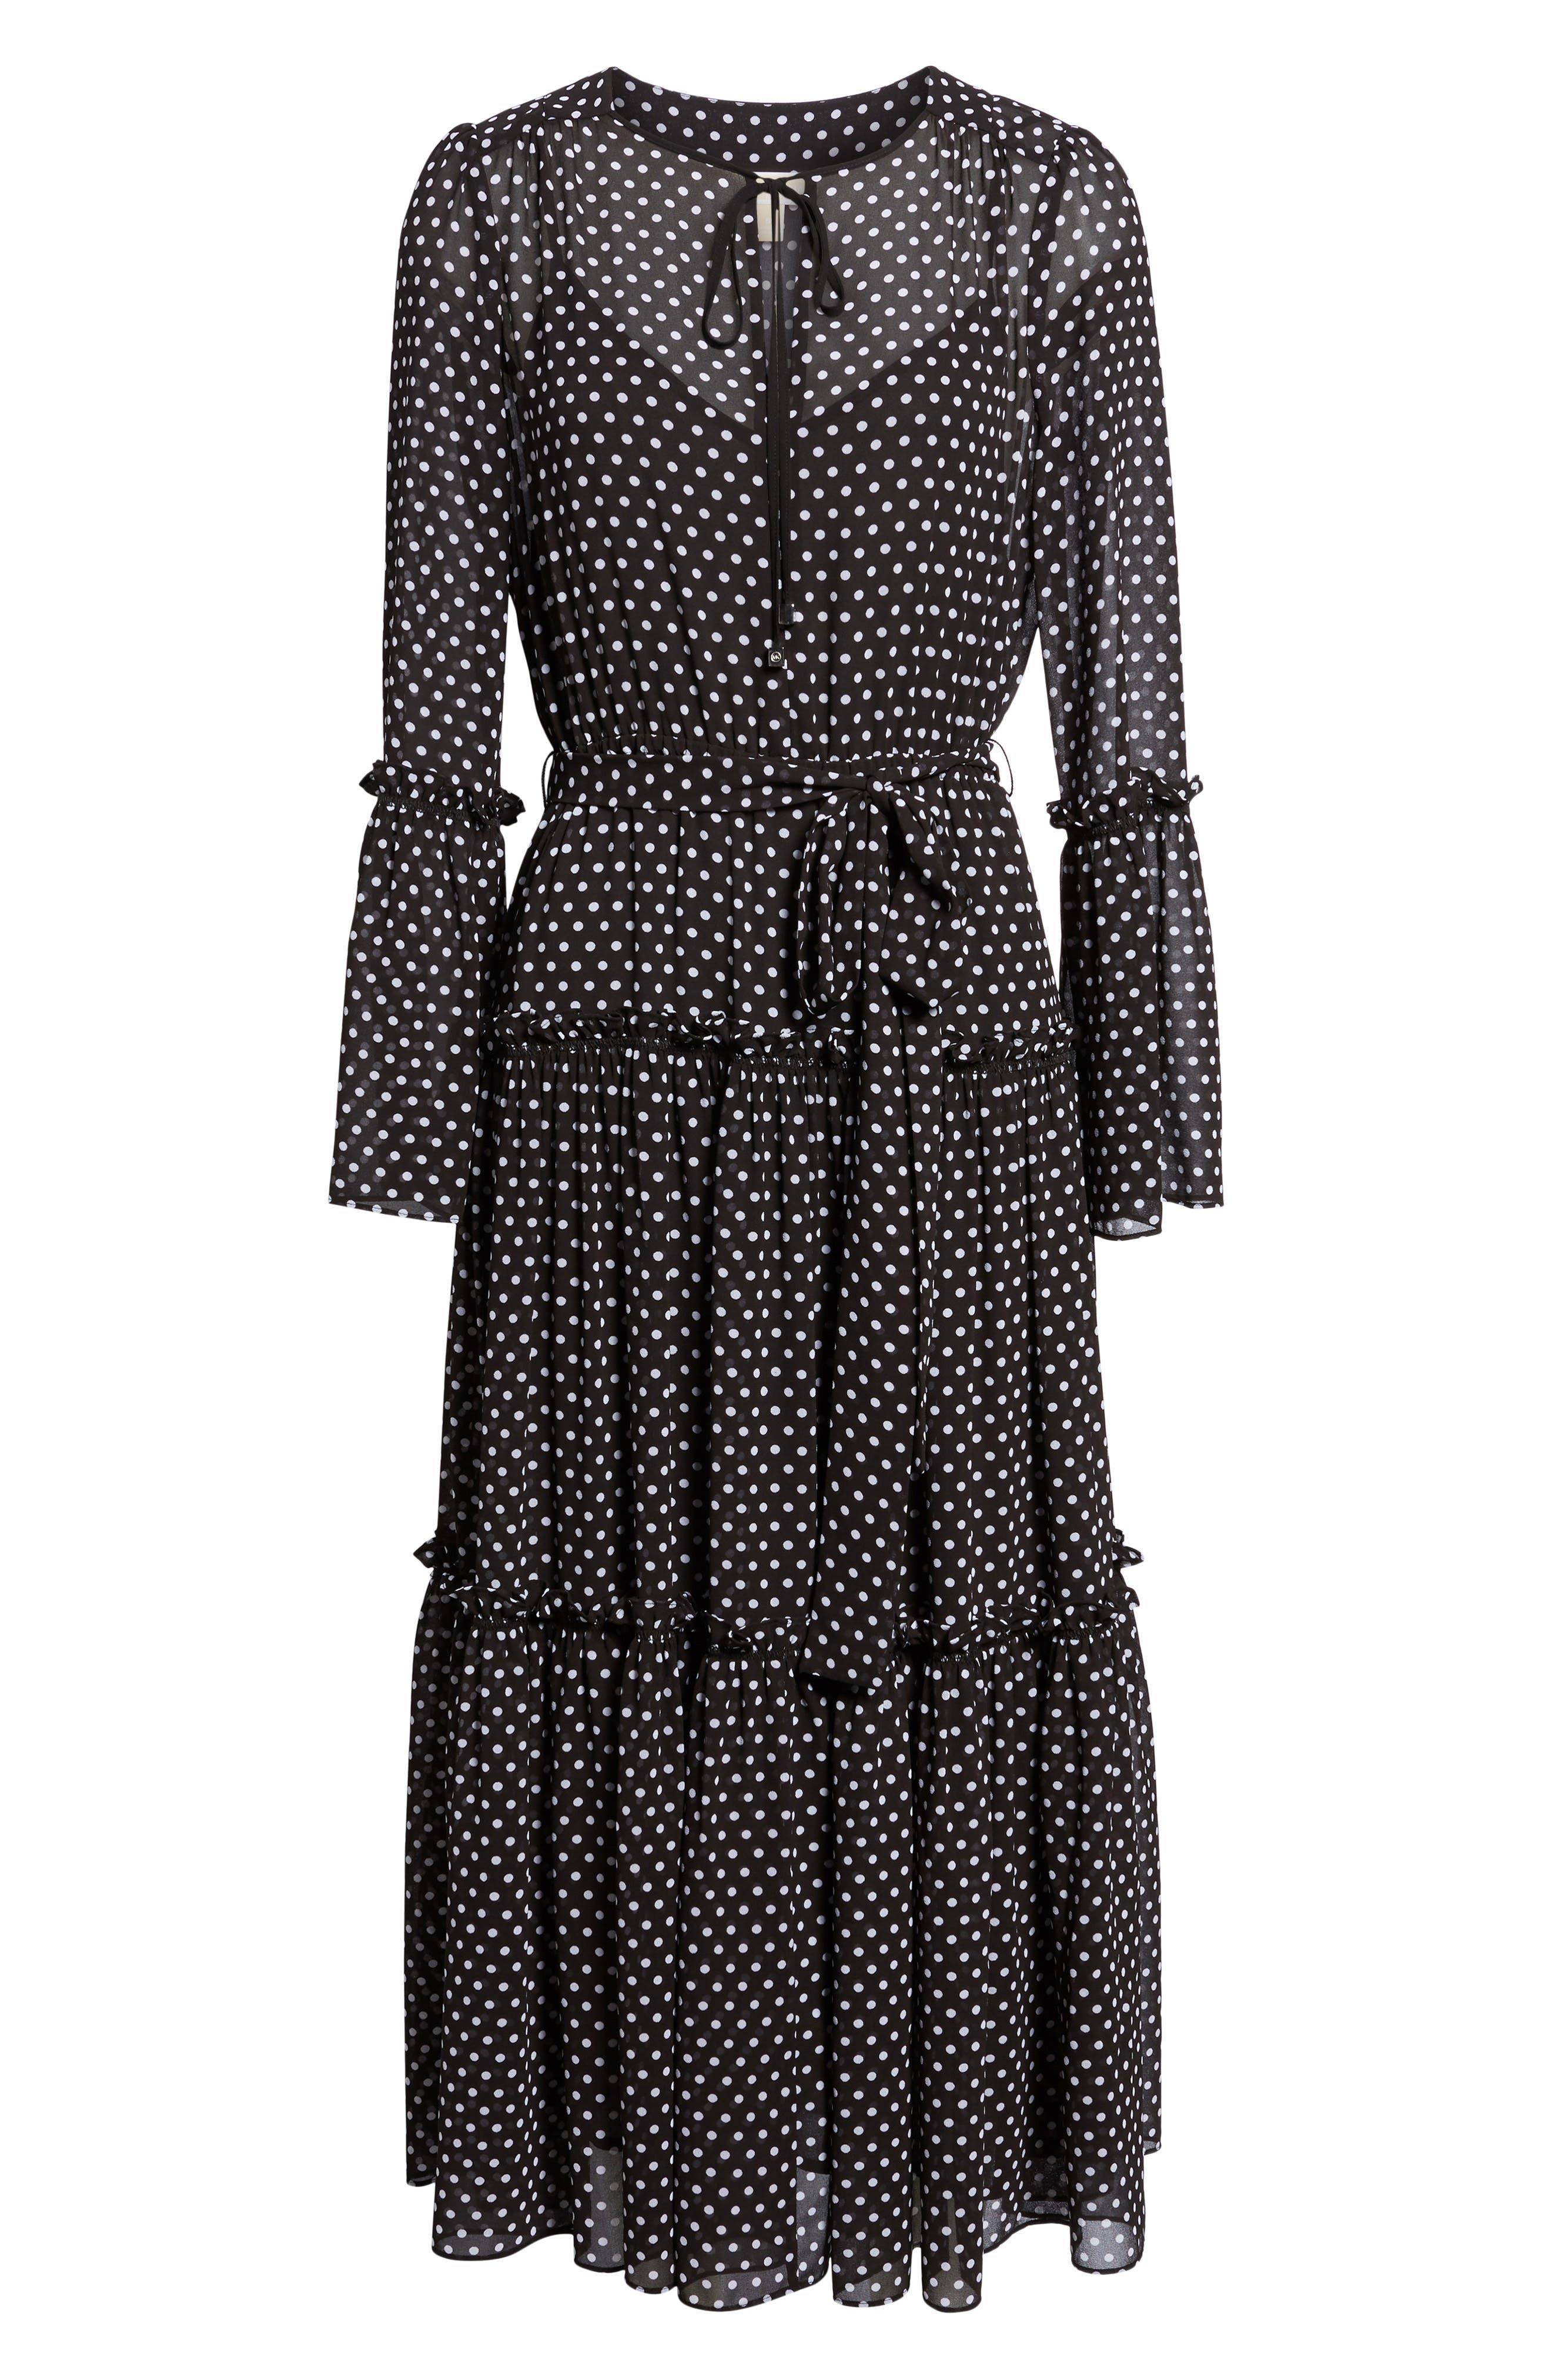 Tiered Dot Boho Dress,                             Alternate thumbnail 6, color,                             Black/ White